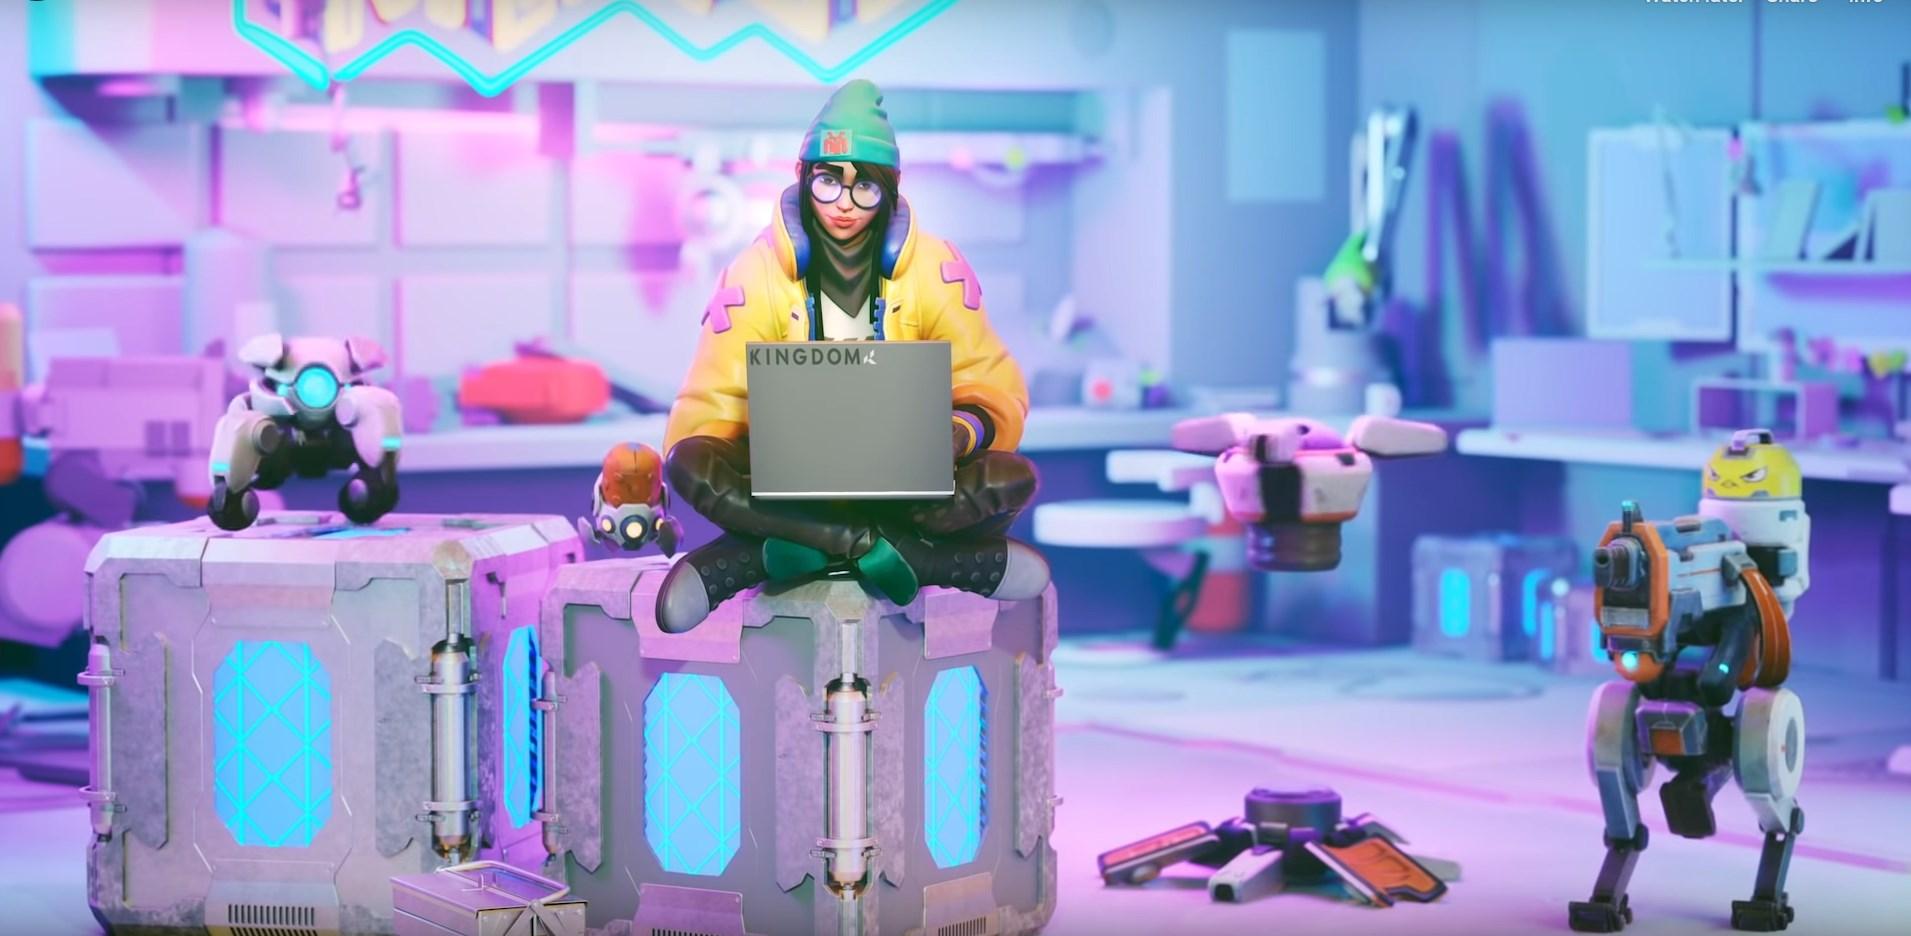 Killjoy on a laptop surround by her robots